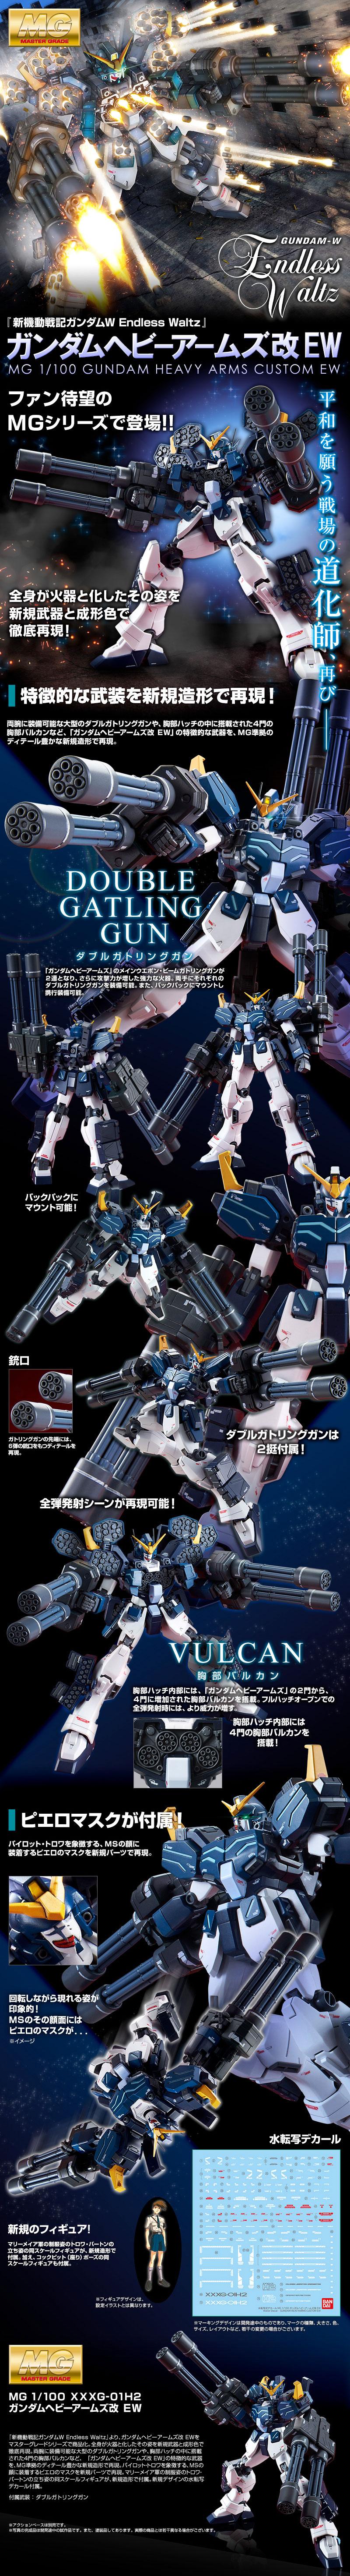 MG Heavyarms Custom